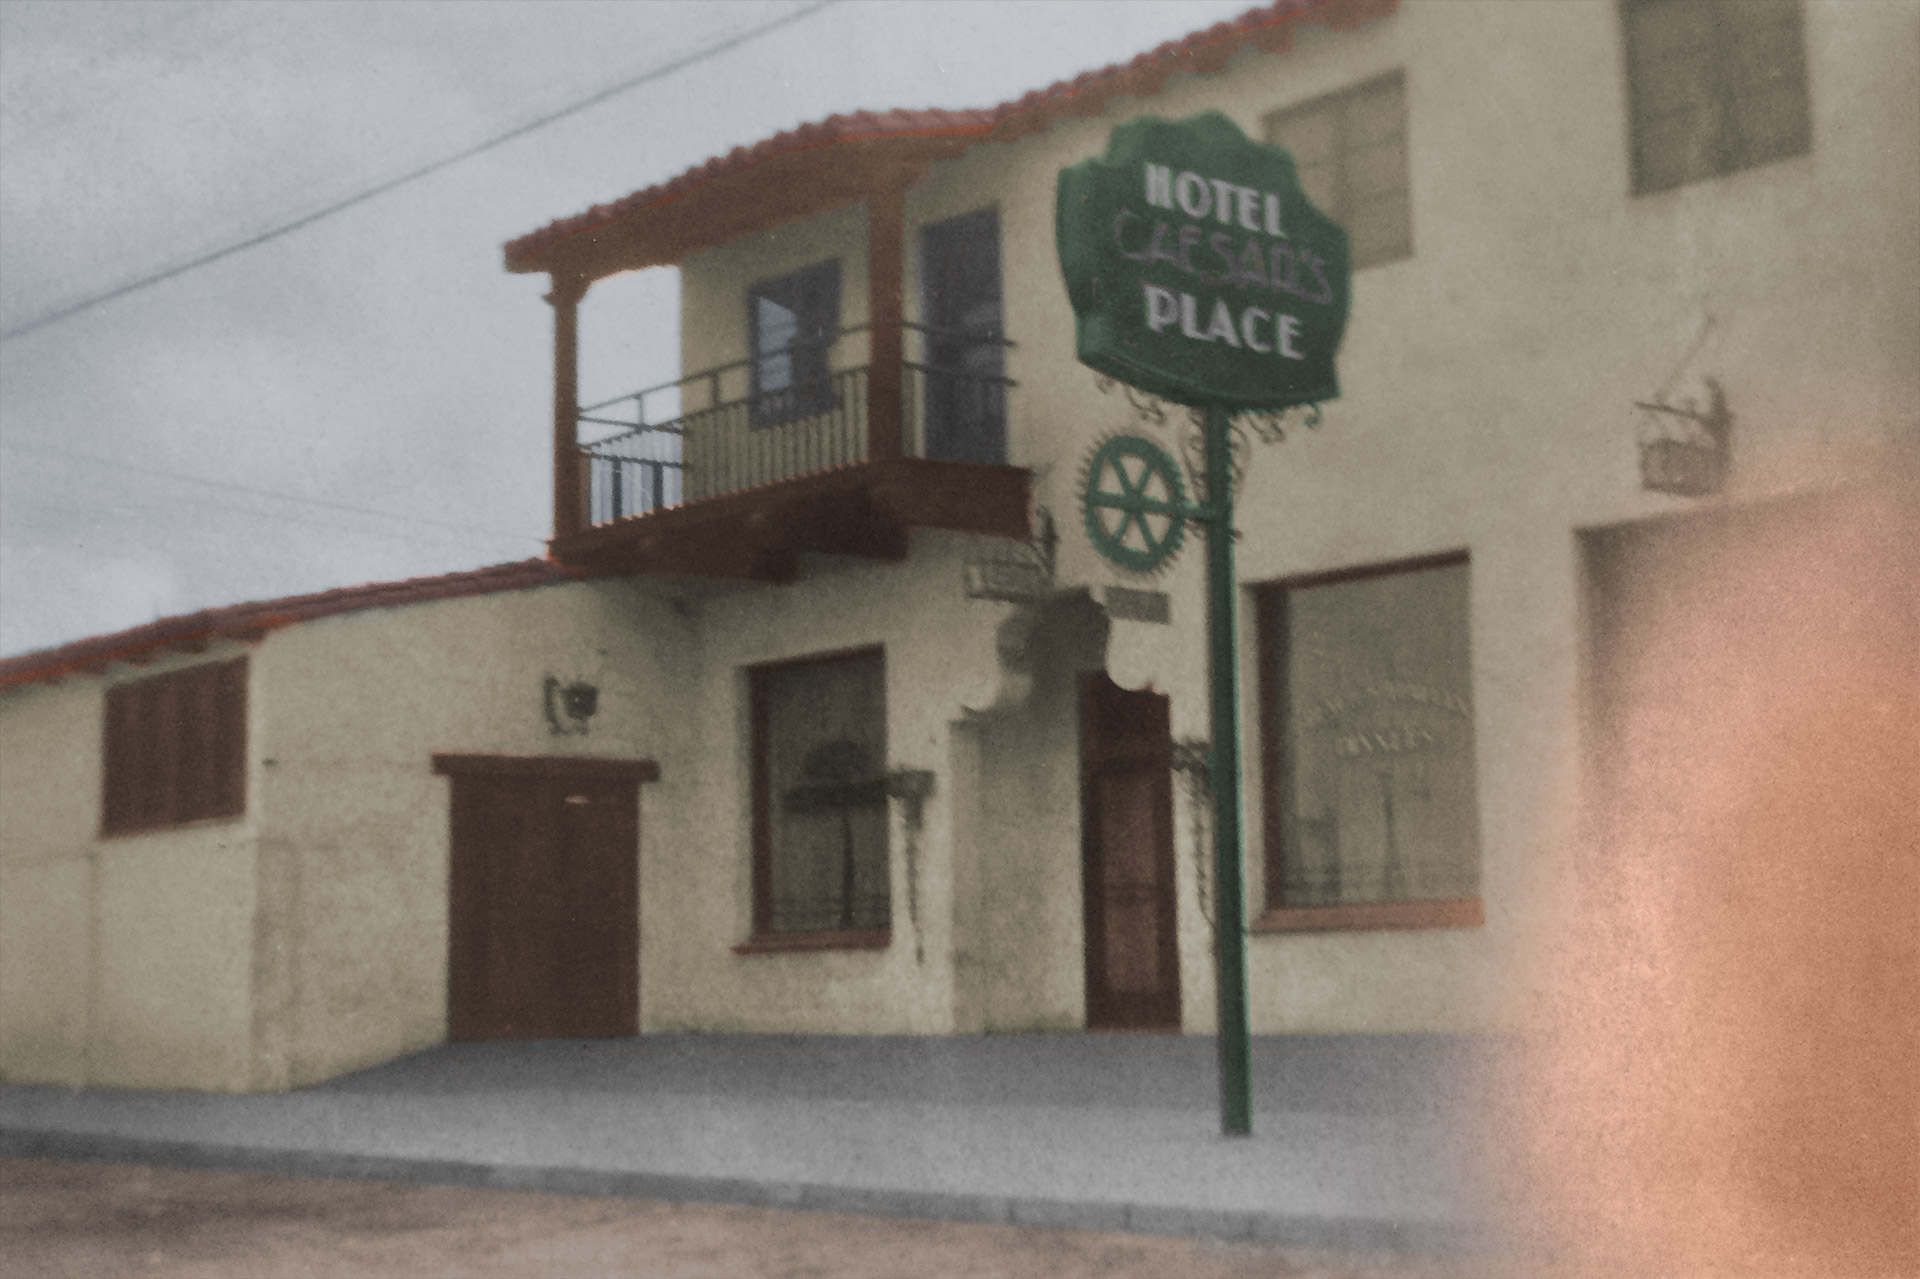 Hotel Caesar's Place, Tijuana, 1931